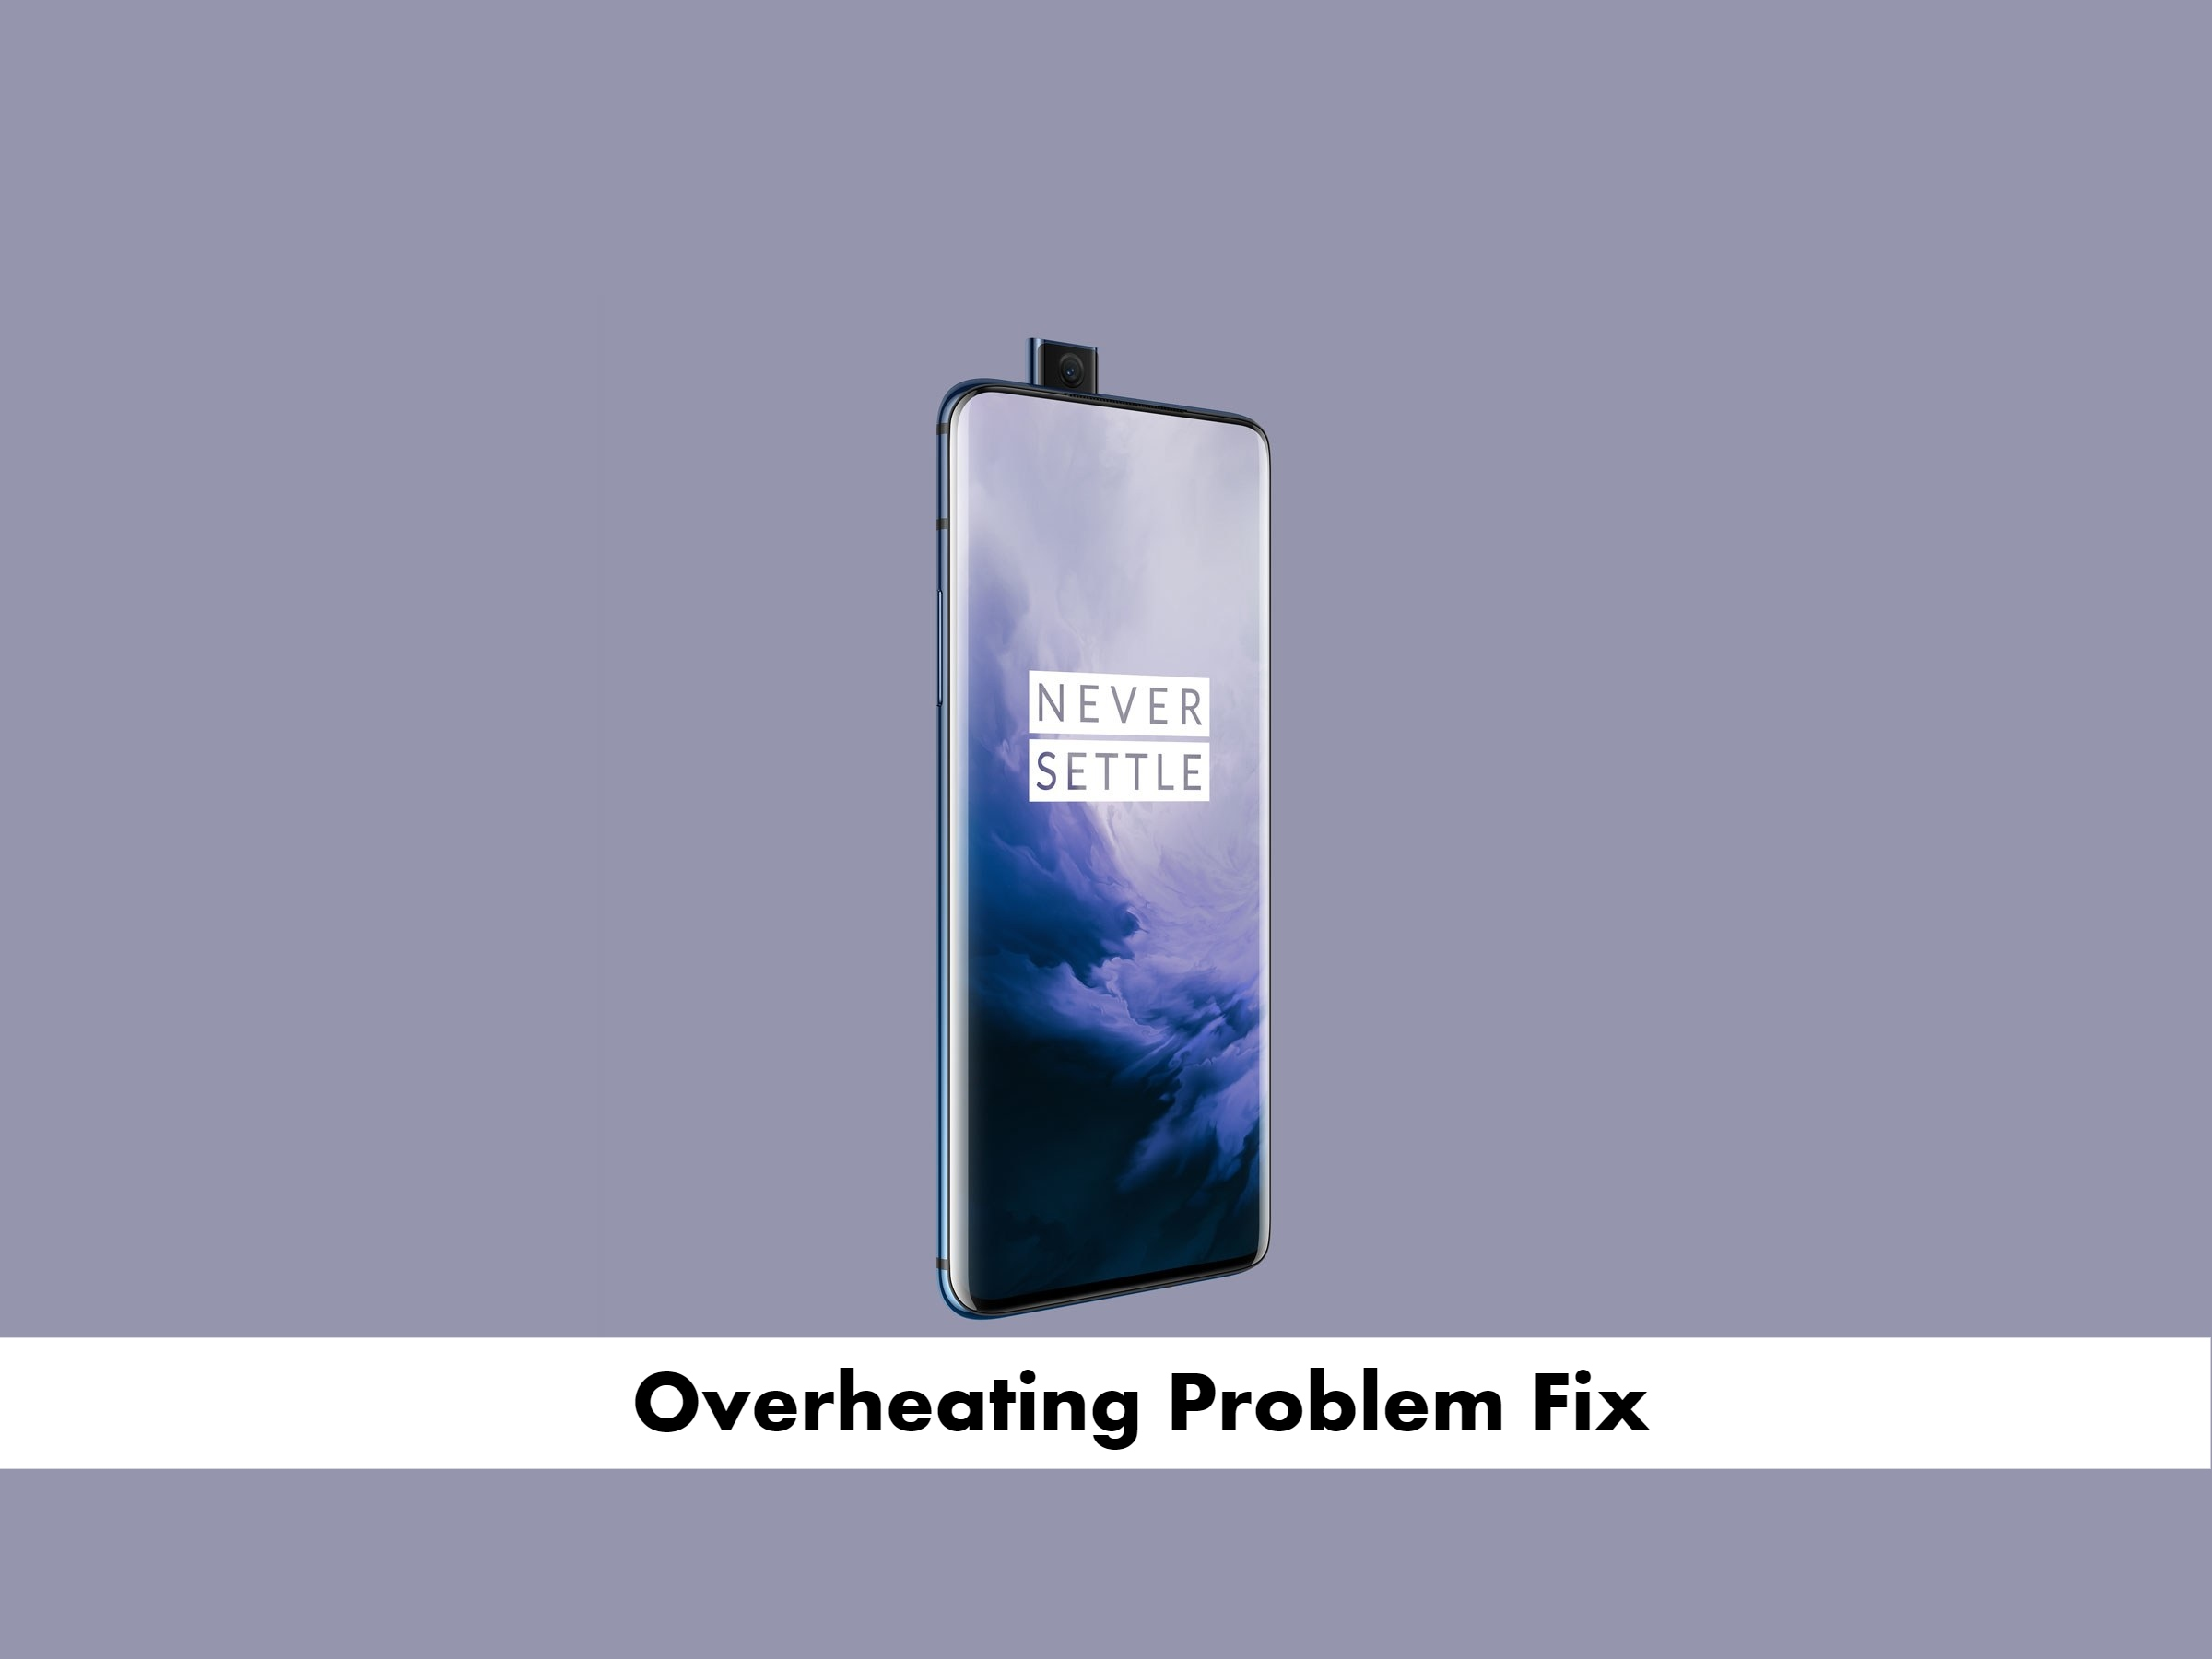 OnePlus 7 Pro overheating